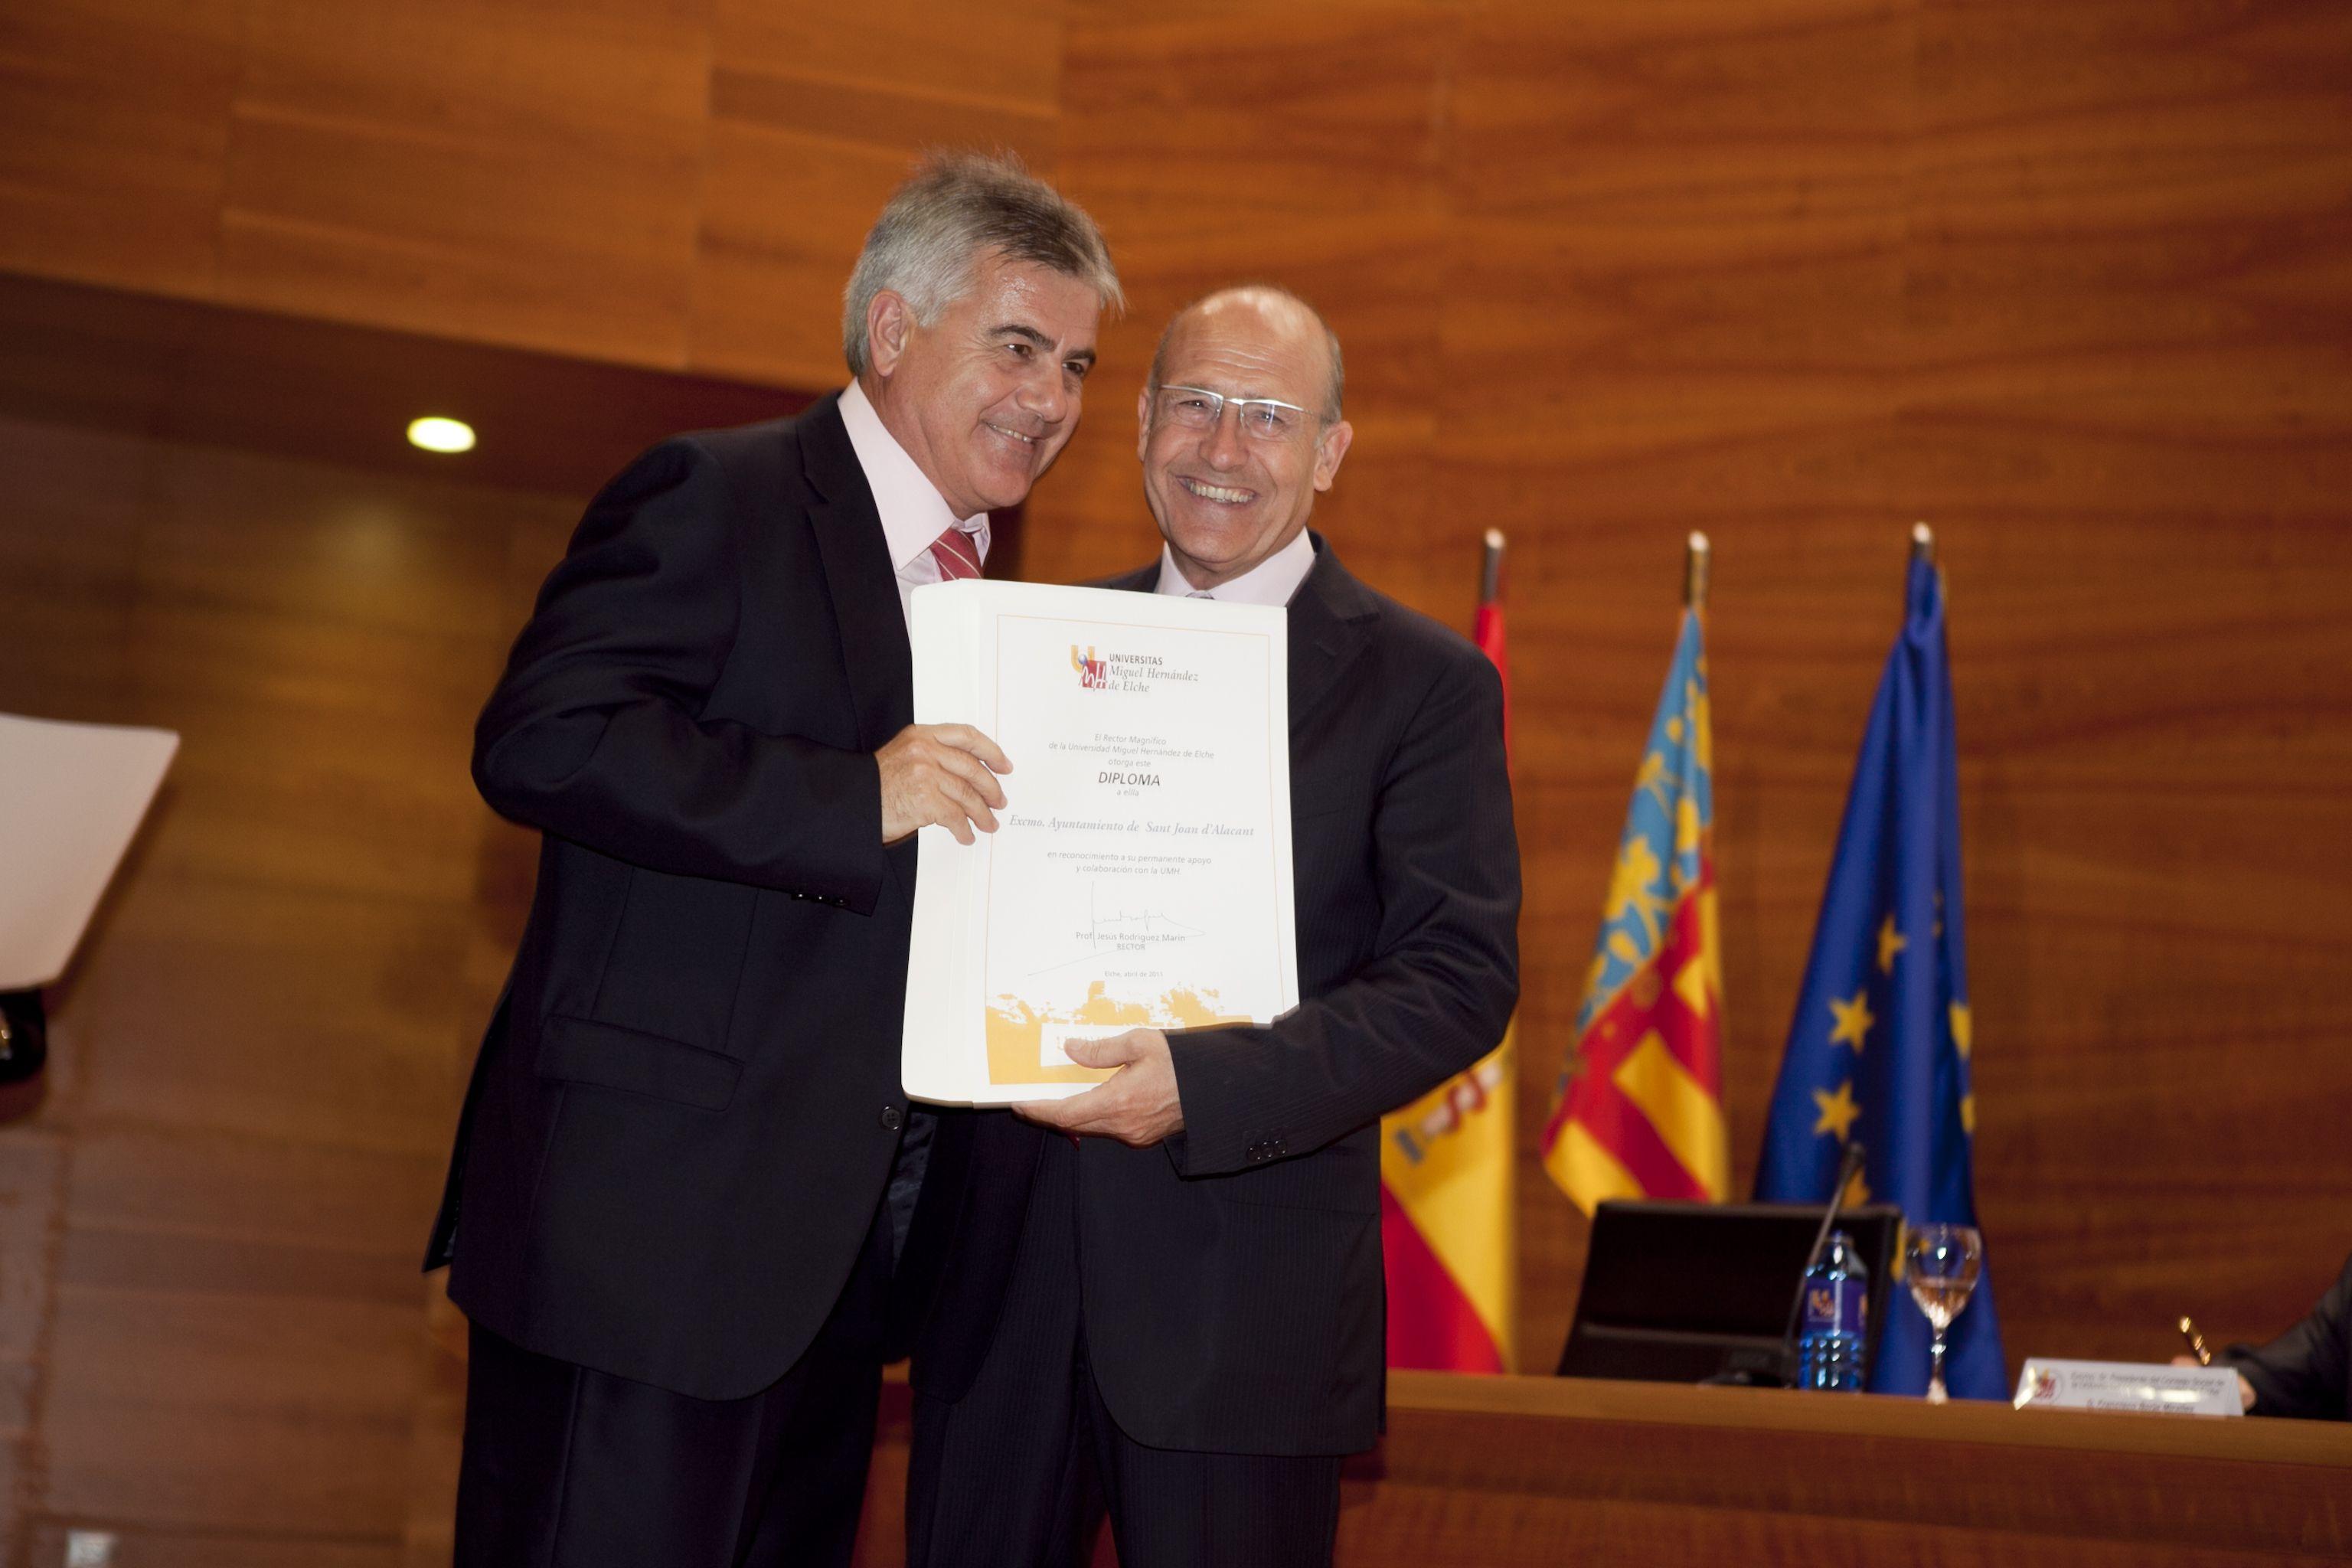 umh-diplomas-rector_mg_7036.jpg